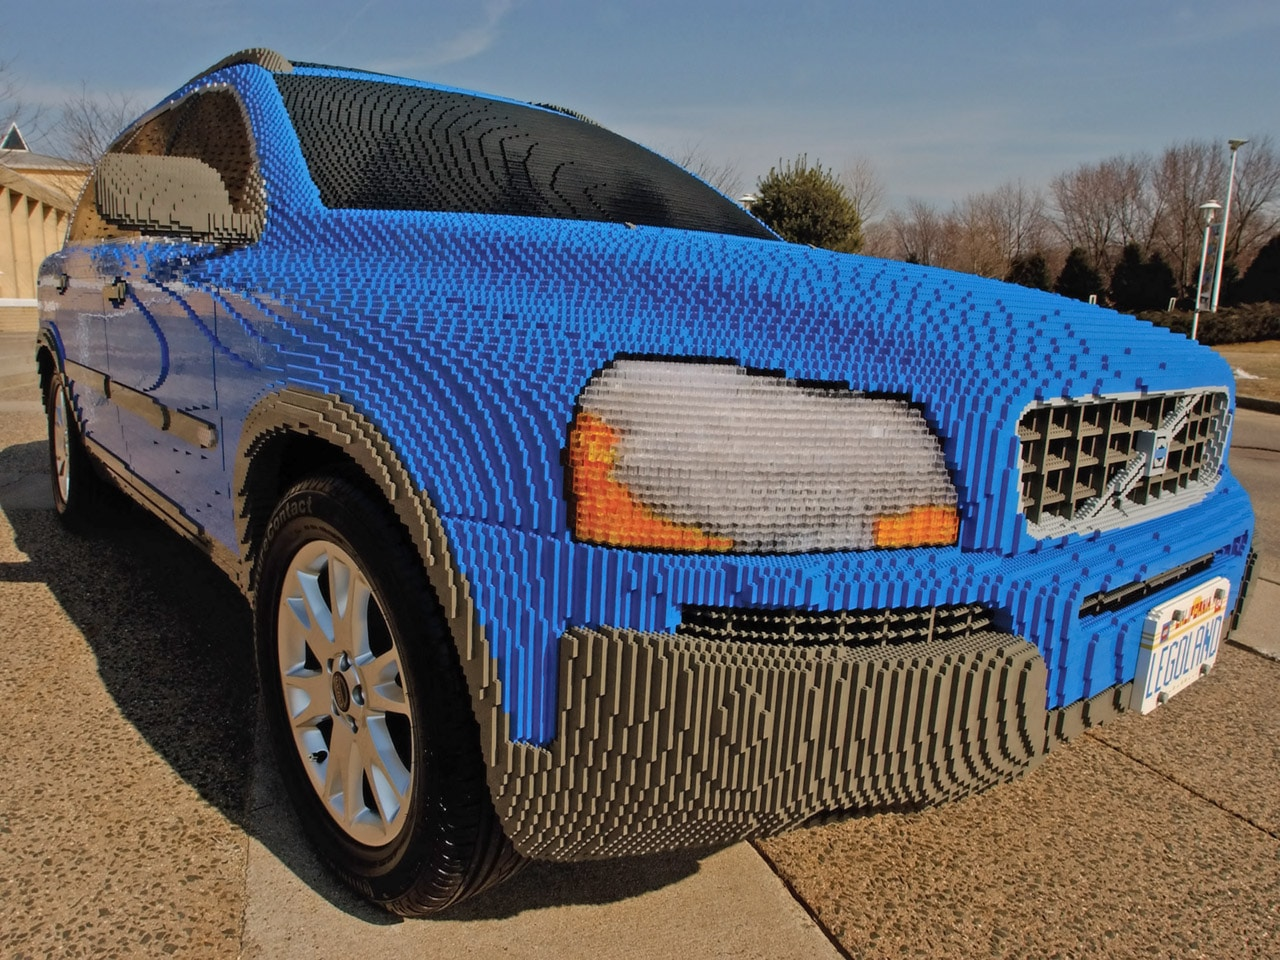 Lego Volvo